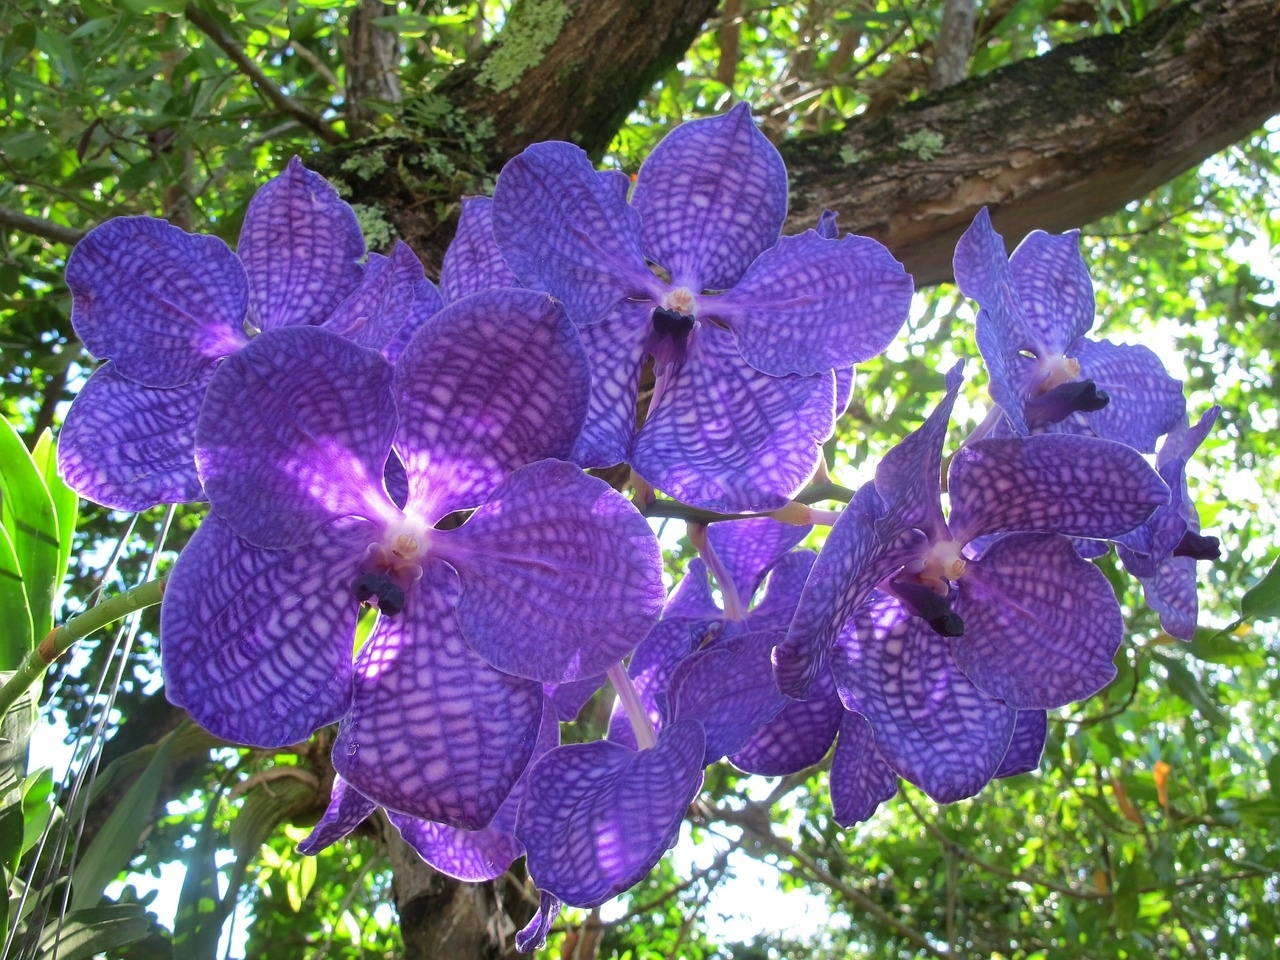 vanda orchidee orchidea vanda. Black Bedroom Furniture Sets. Home Design Ideas